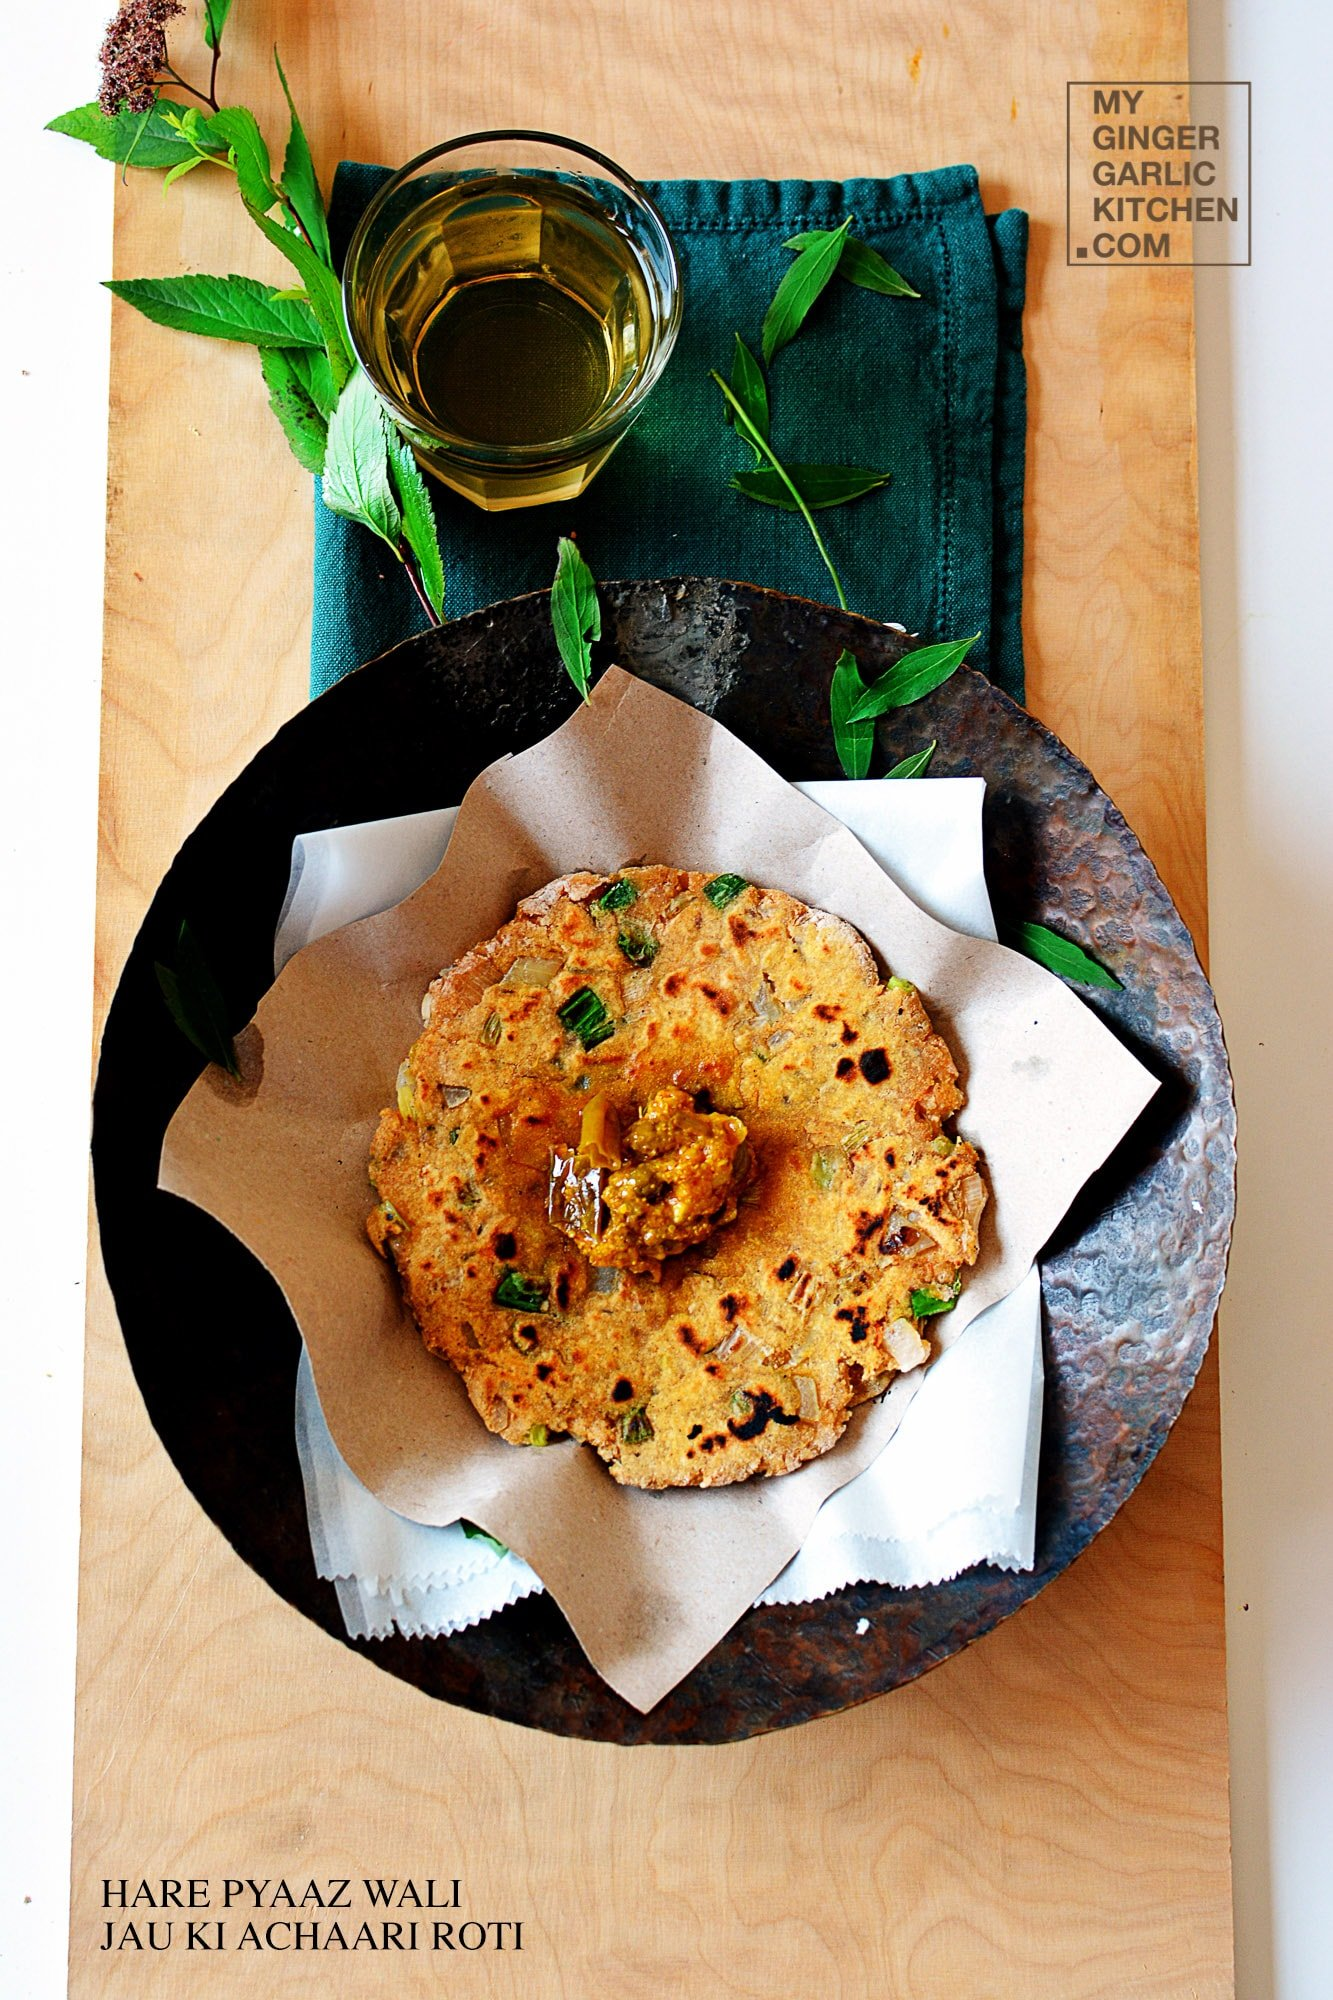 Image - recipe hare pyaz wali jau ki achari roti anupama paliwal my ginger garlic kitchen 7 copy